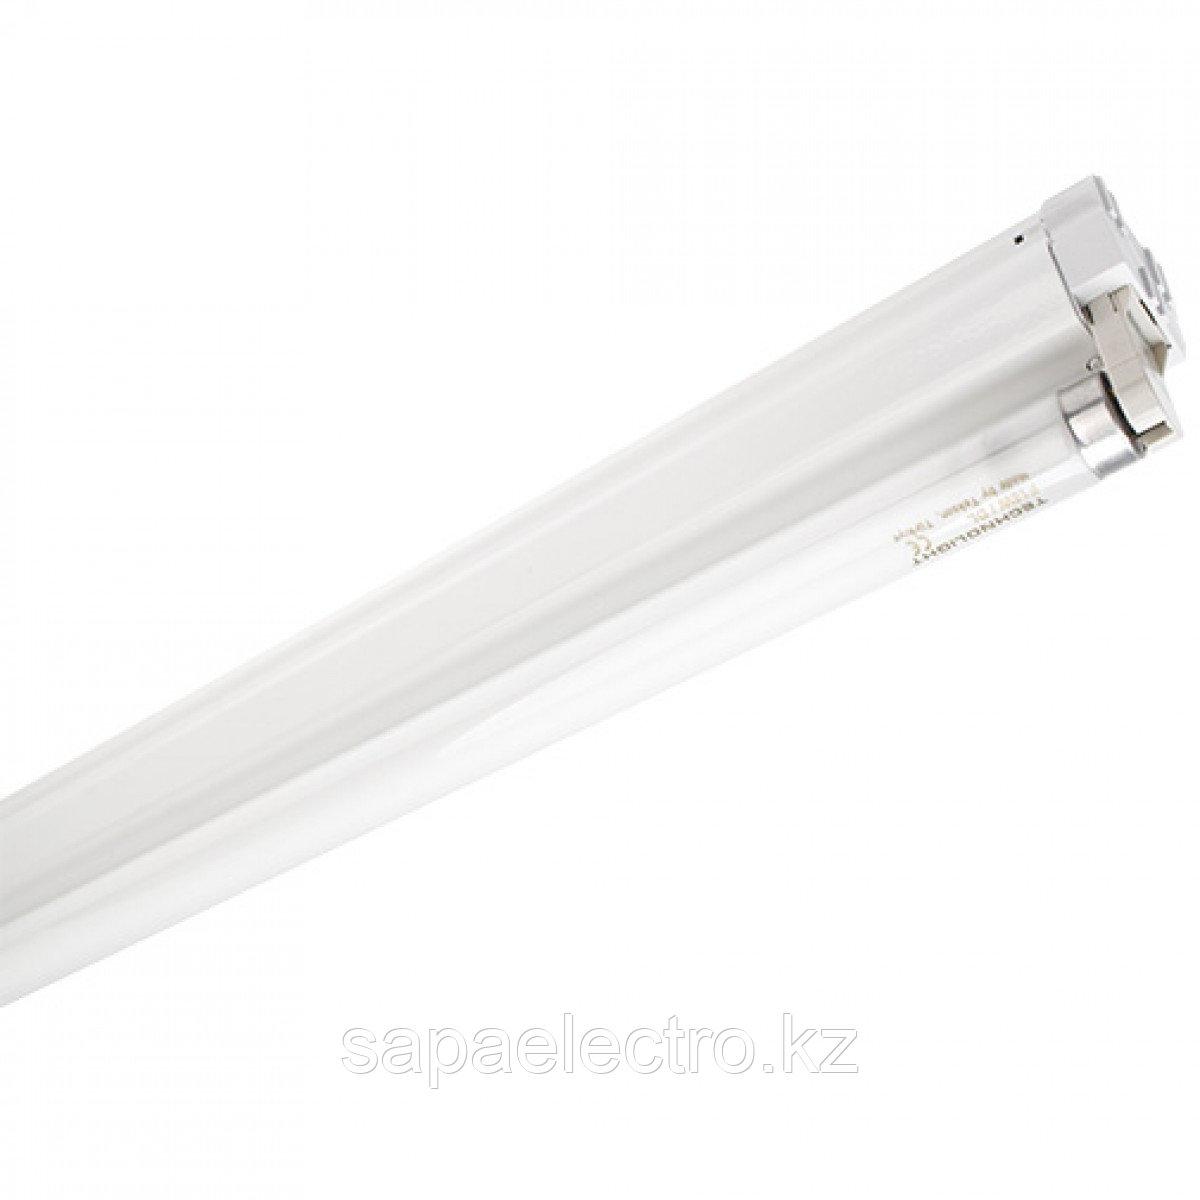 Св-к LEDTUBE TMS 1х18W +лампа (1.20см) MEGALUX (TS)